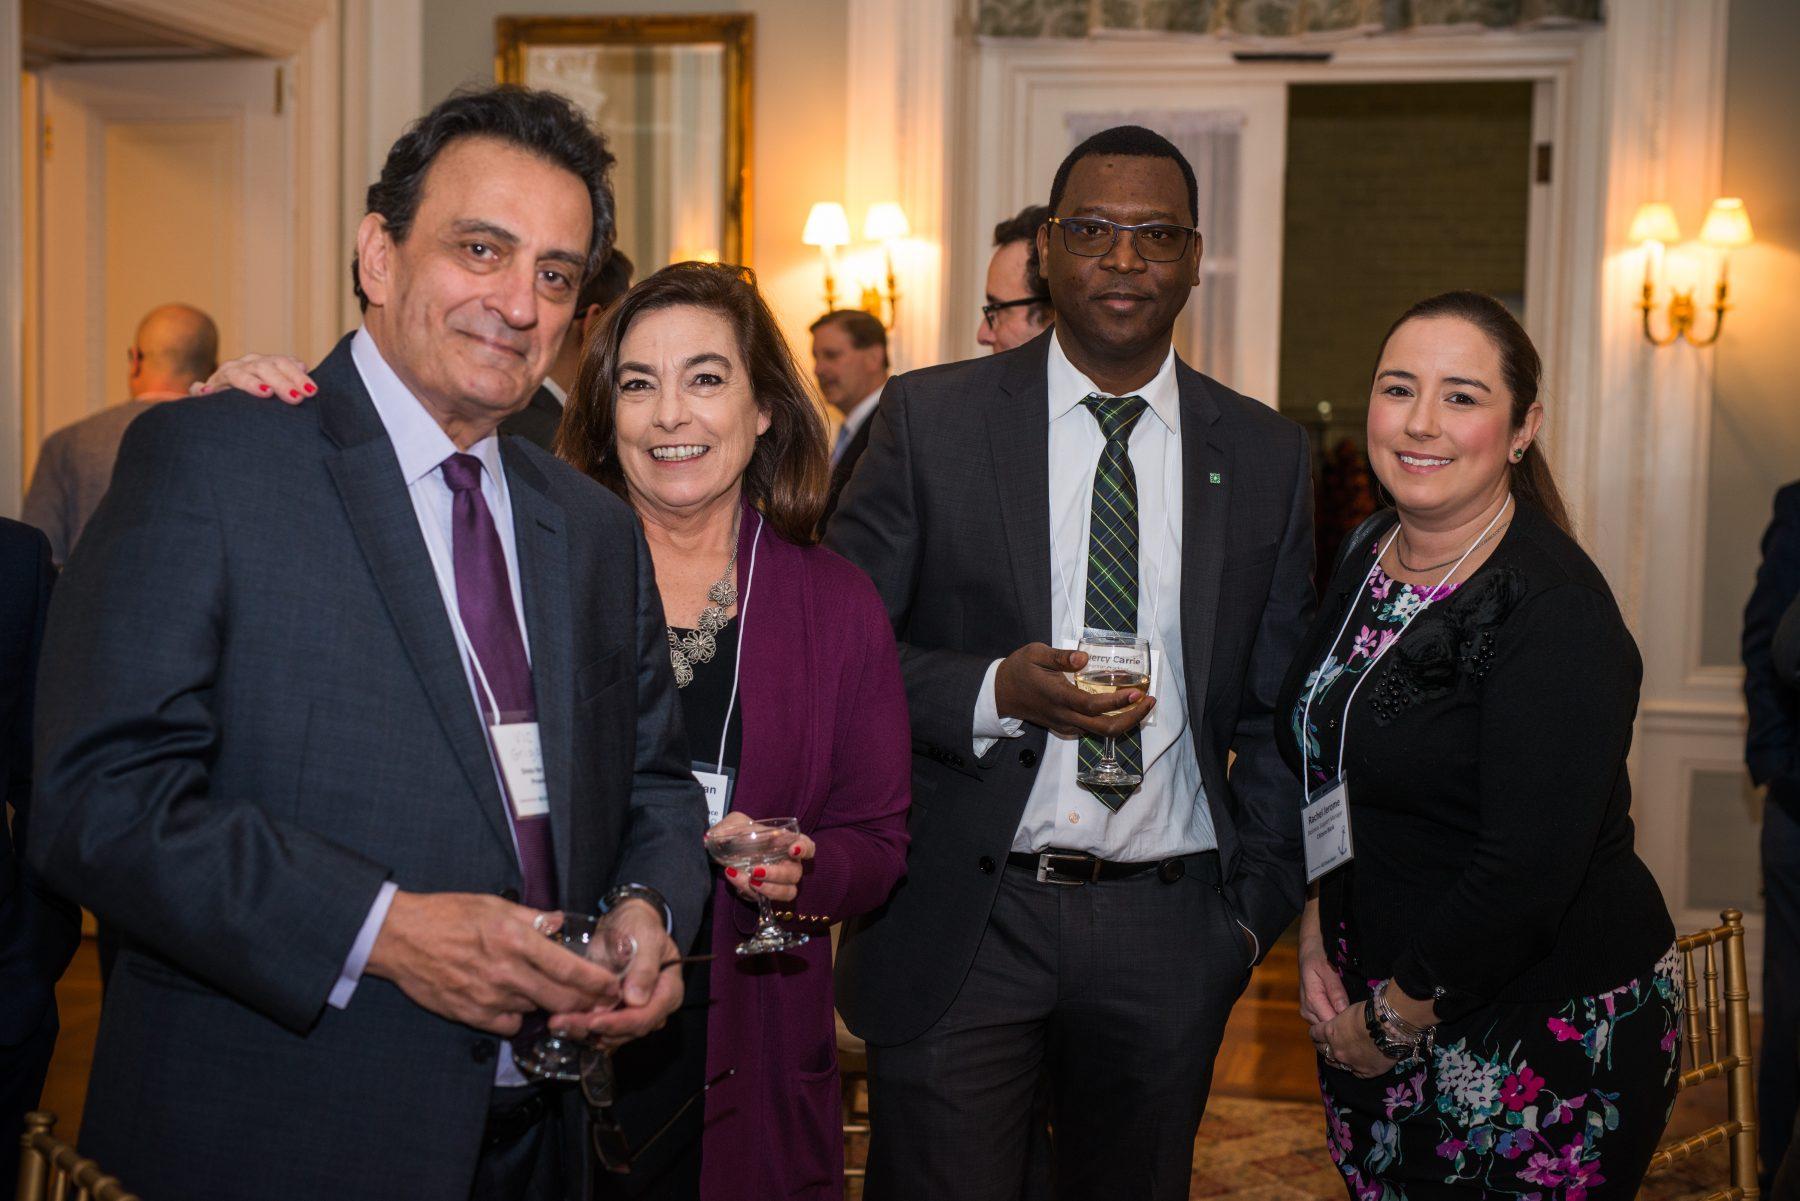 Aldrich Mansion Warwick RI Monthly 2019 Common Good Awards Blueflash Photography 4